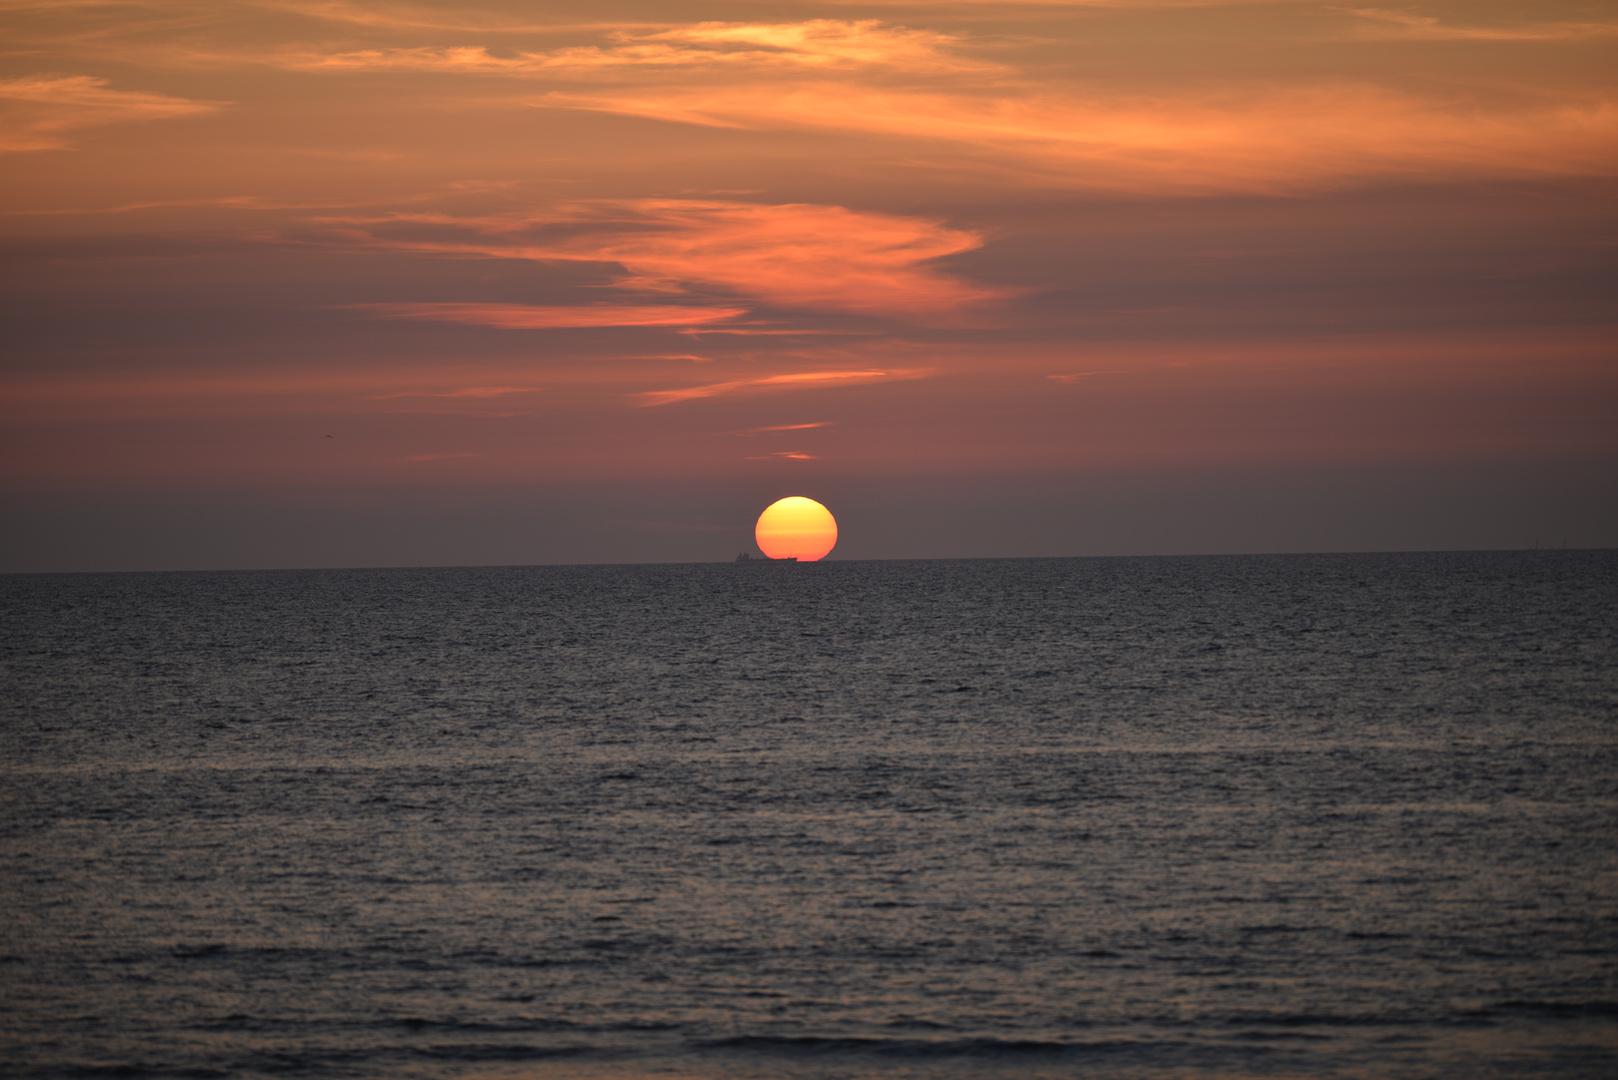 Sonnenuntergang Texel - Juli 2013